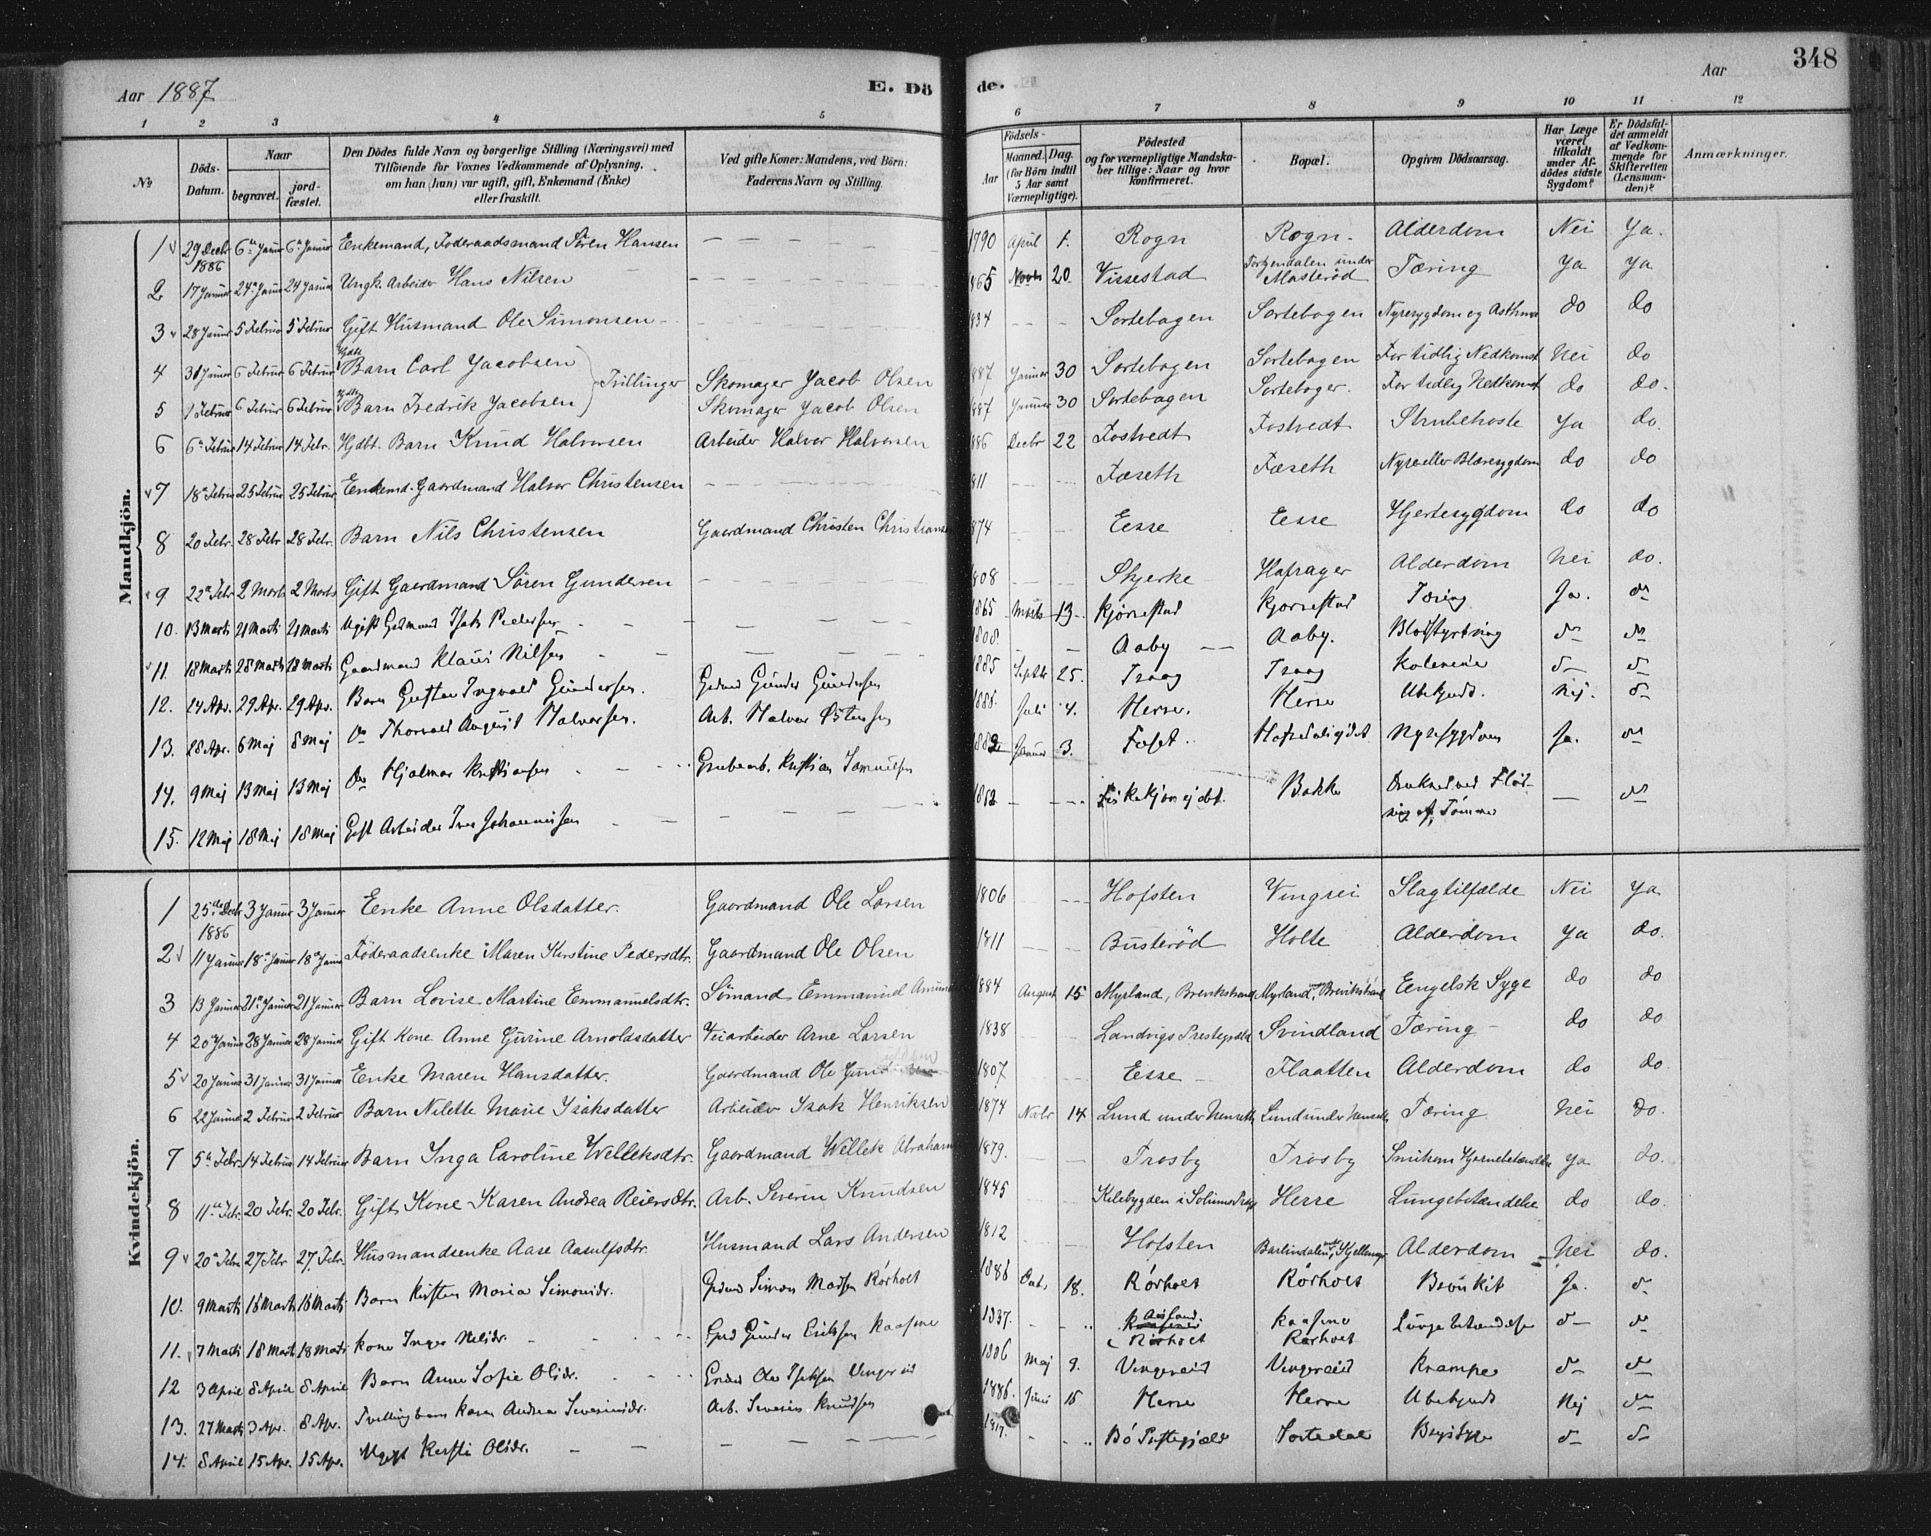 SAKO, Bamble kirkebøker, F/Fa/L0007: Ministerialbok nr. I 7, 1878-1888, s. 348